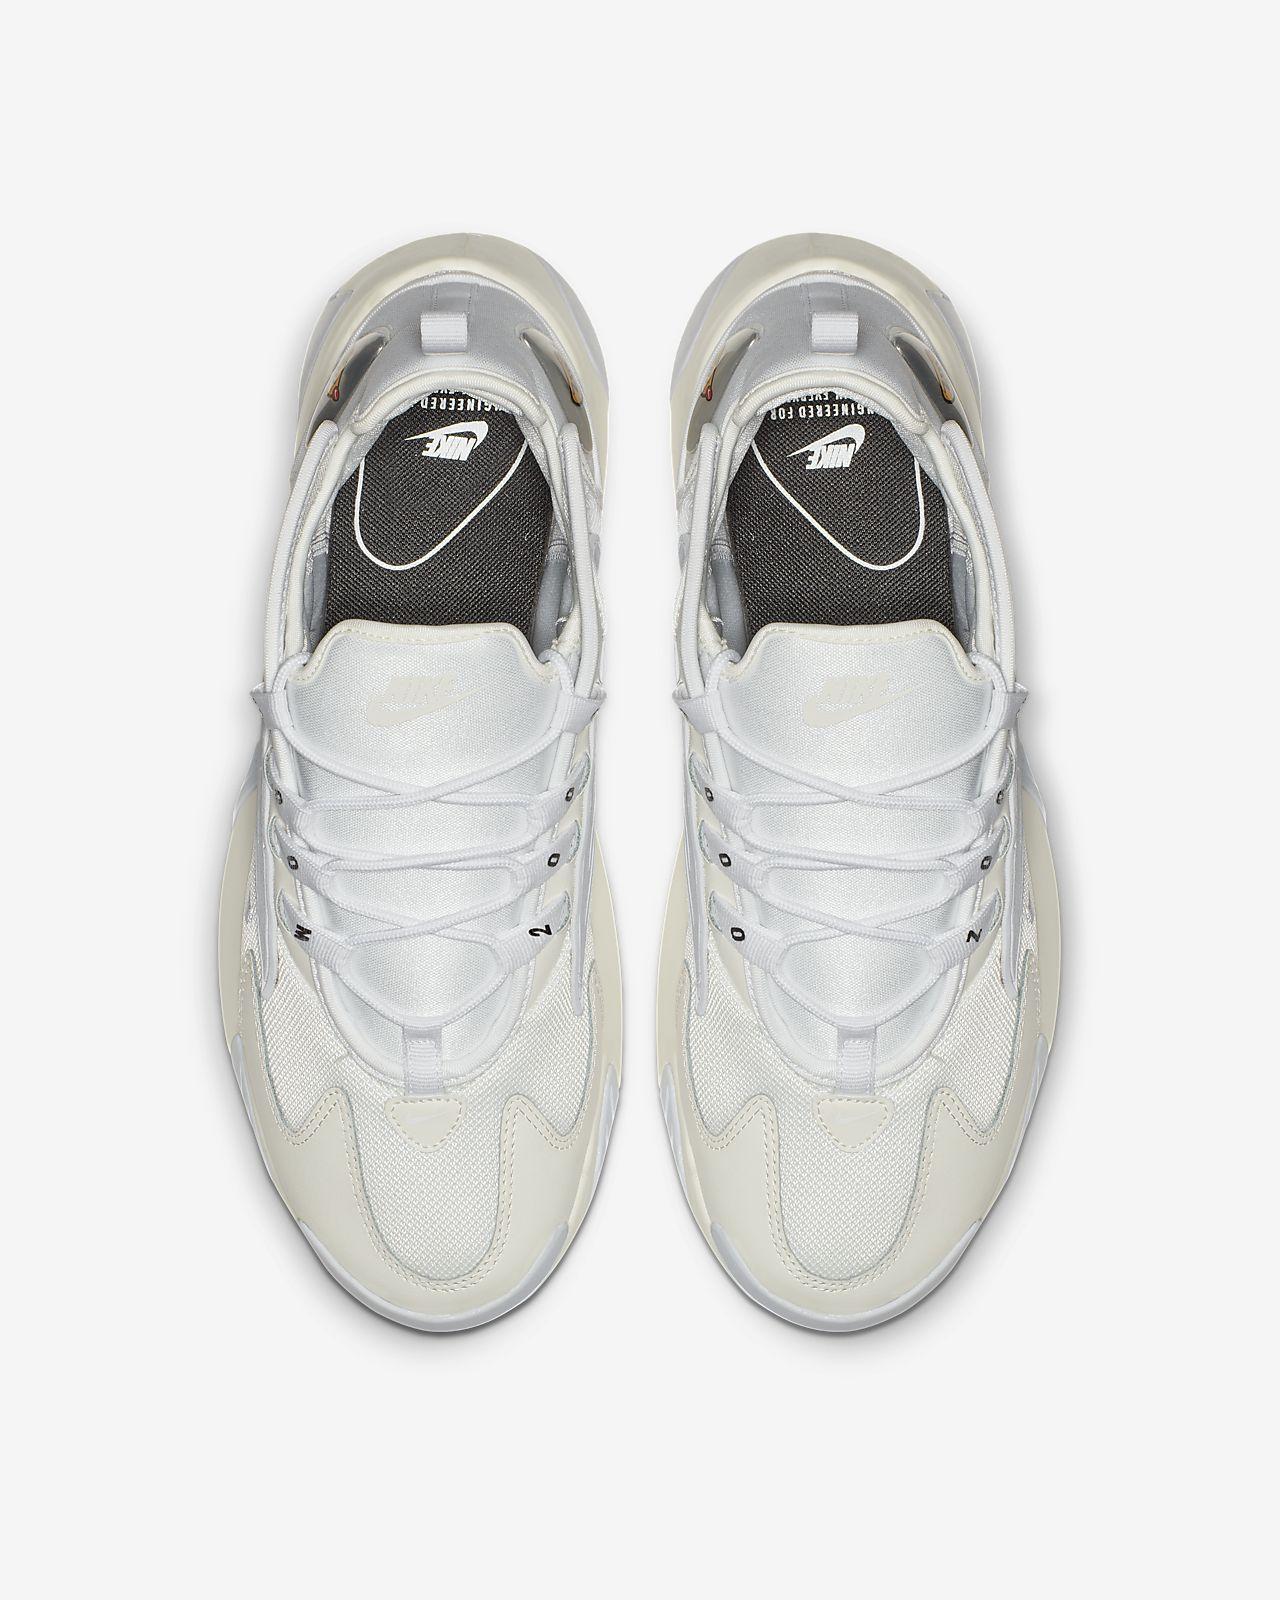 5c3db56cb162 Nike Zoom 2K Men s Shoe. Nike.com BG